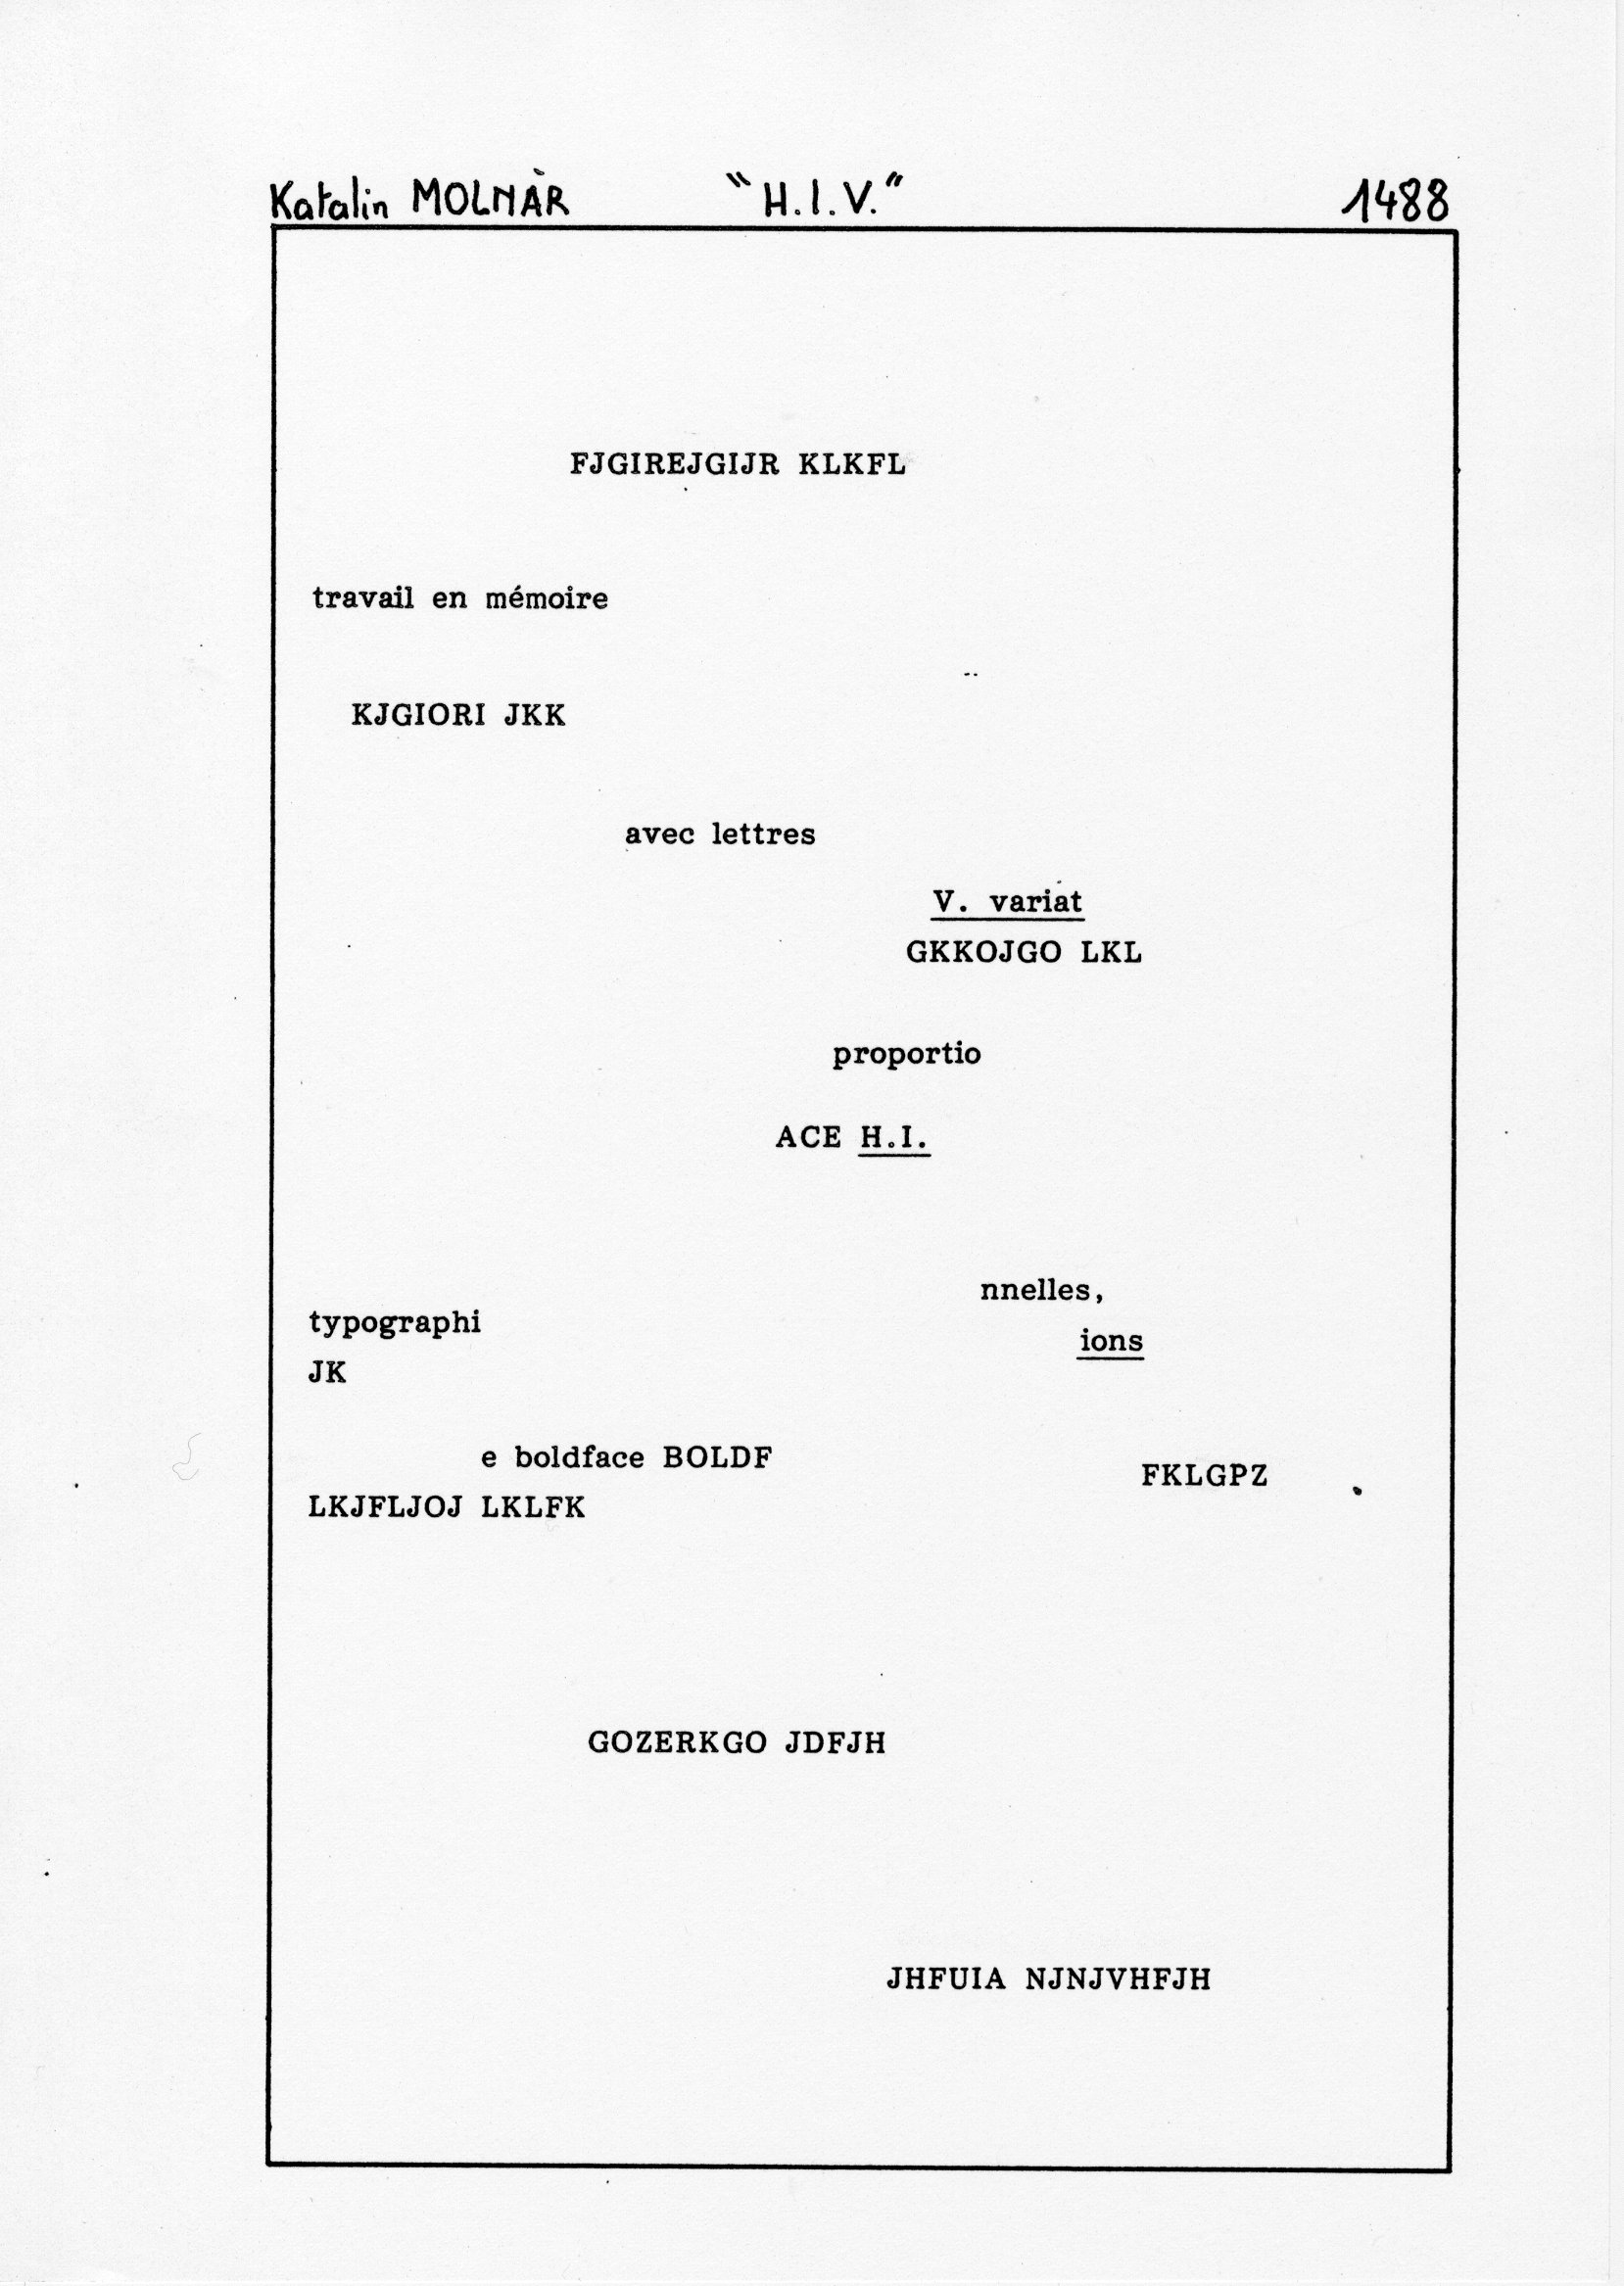 page 1488 K. Molnar H.I.V.